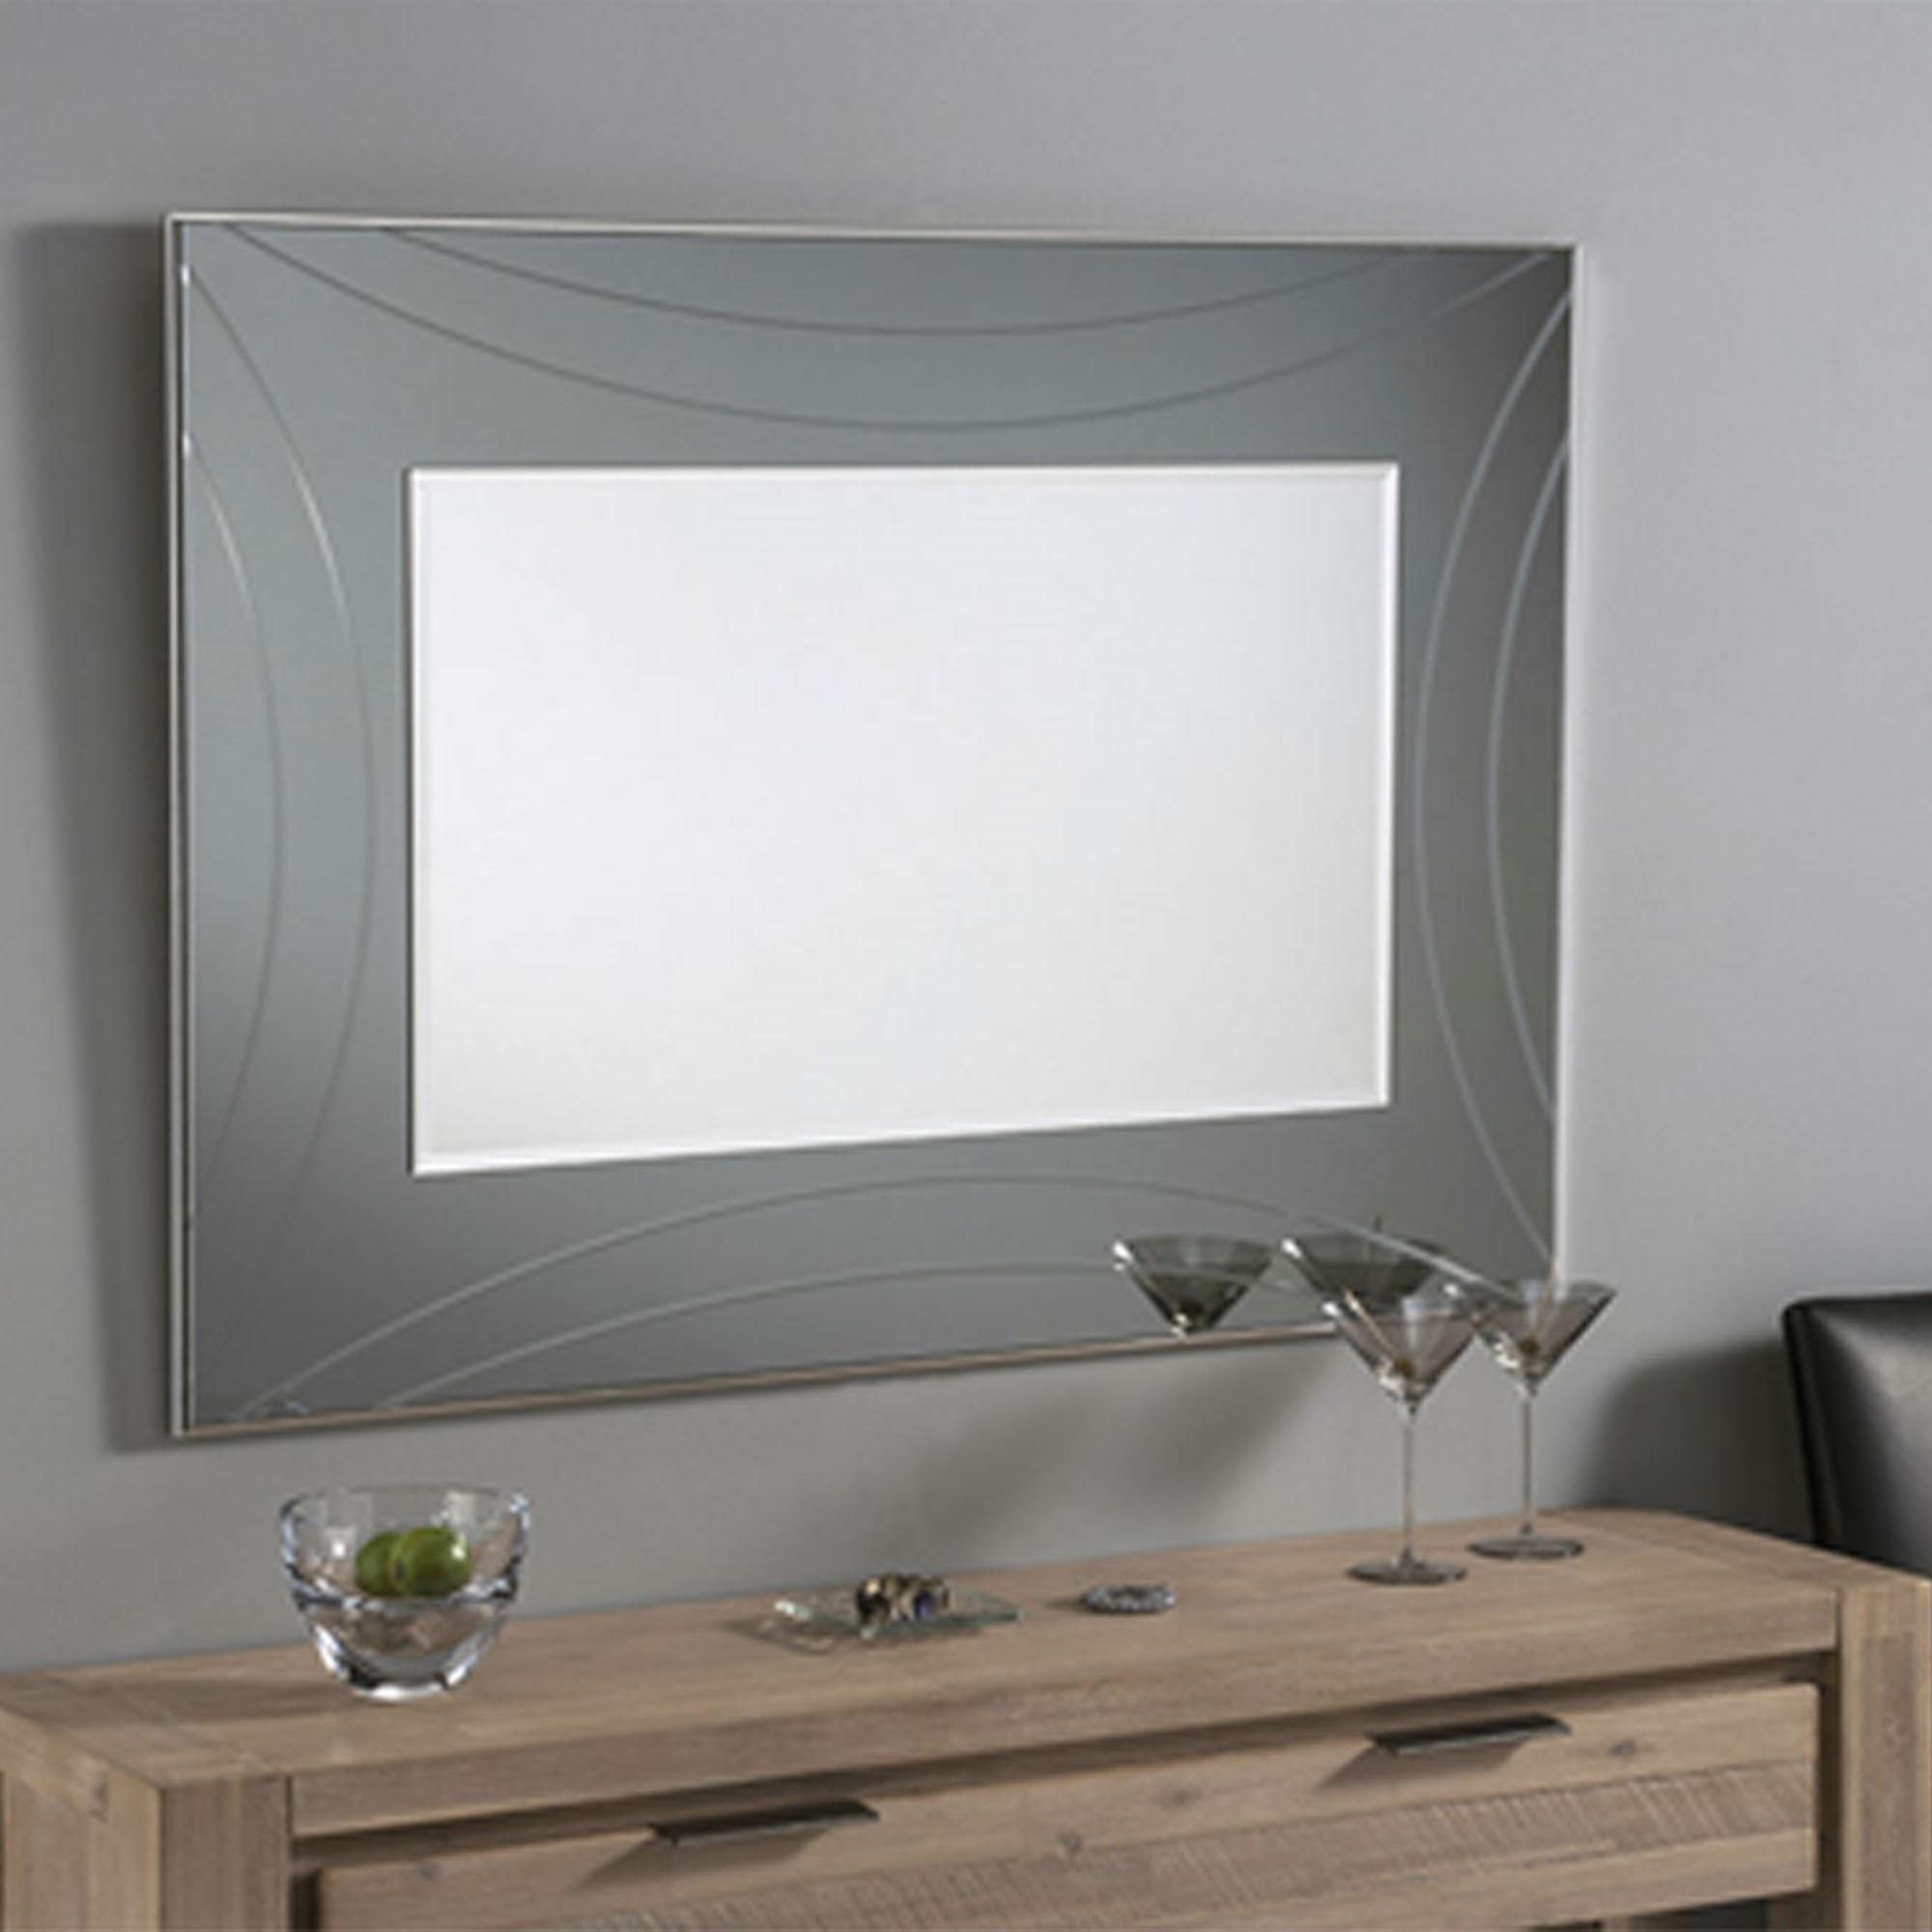 Contemporary Wall Mirror Grey Rectangular Bold Frame Wall Mirrors